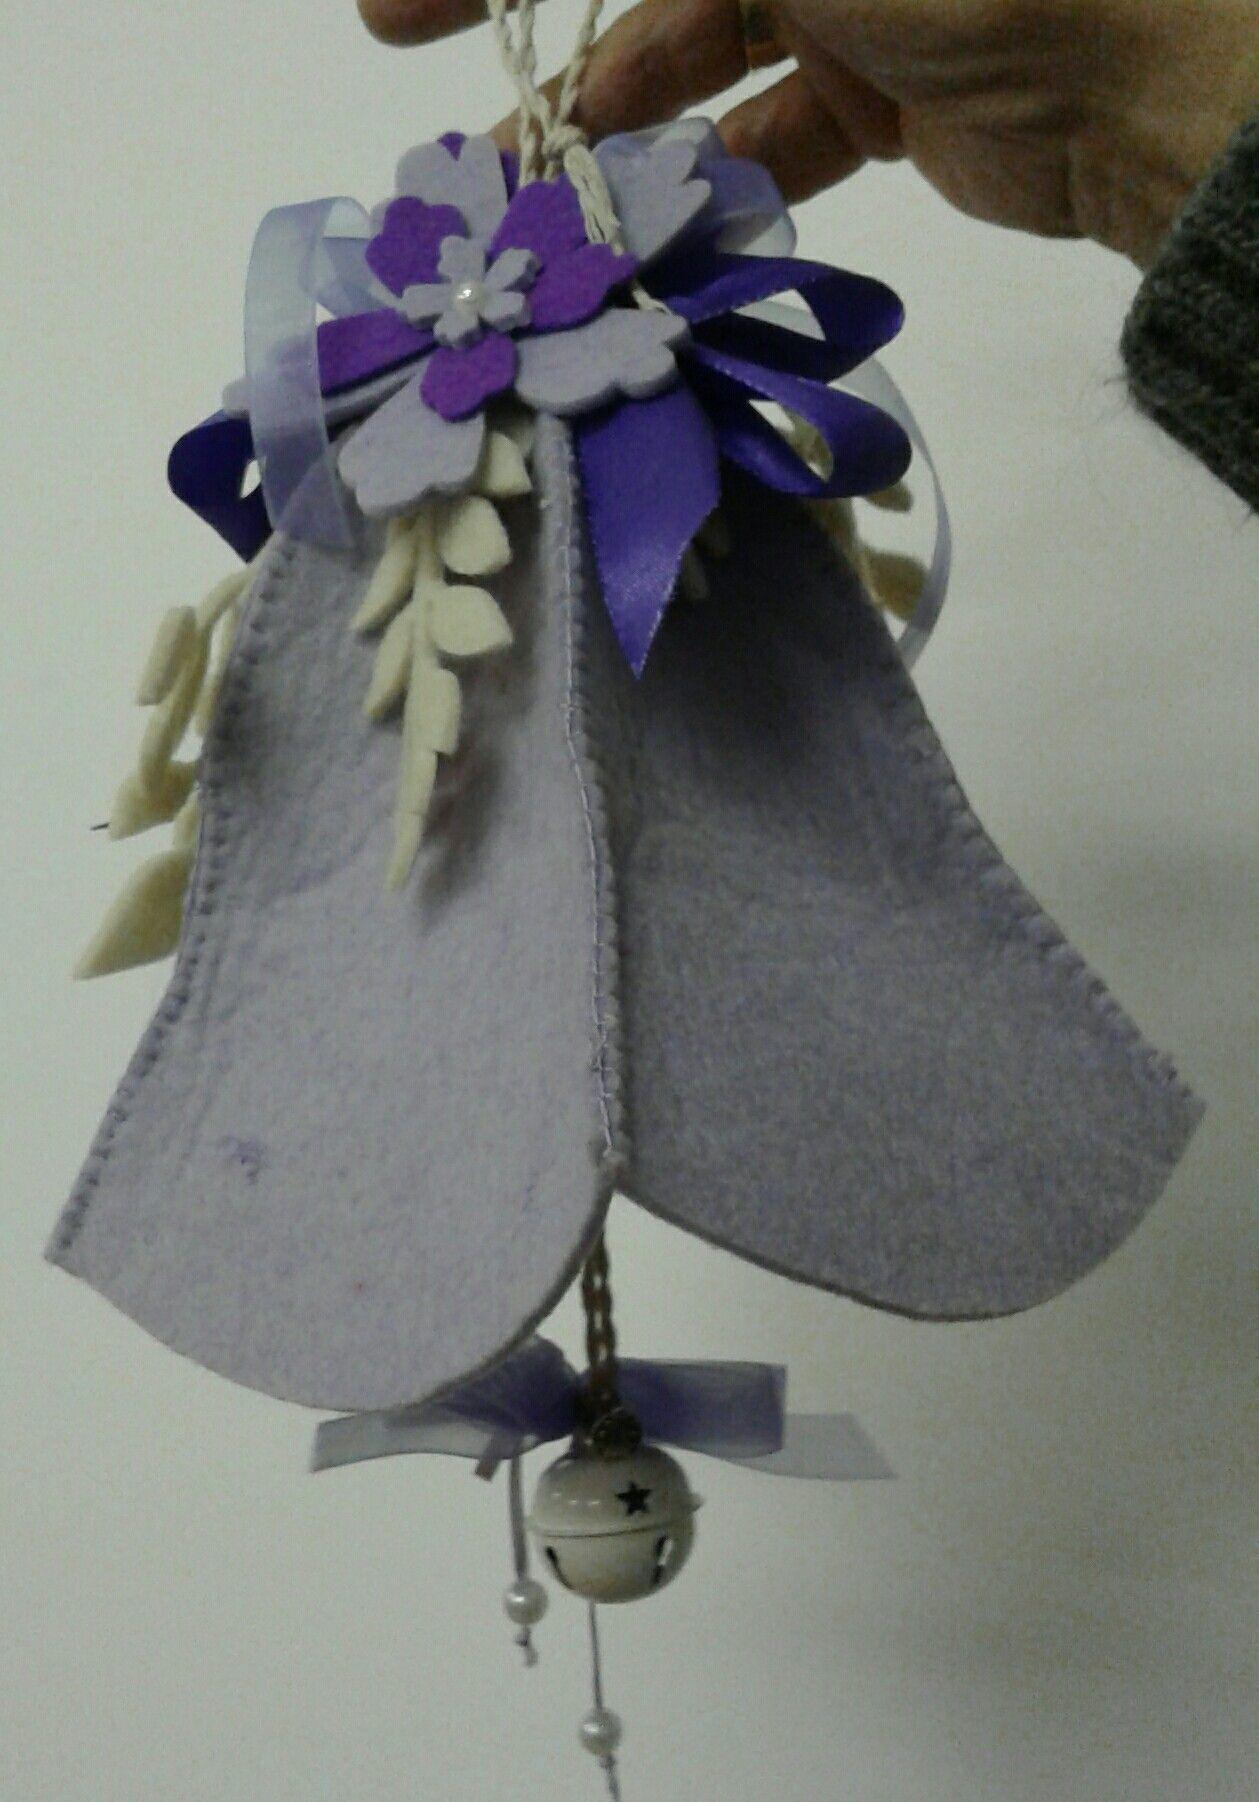 campana in feltro - di Vanda